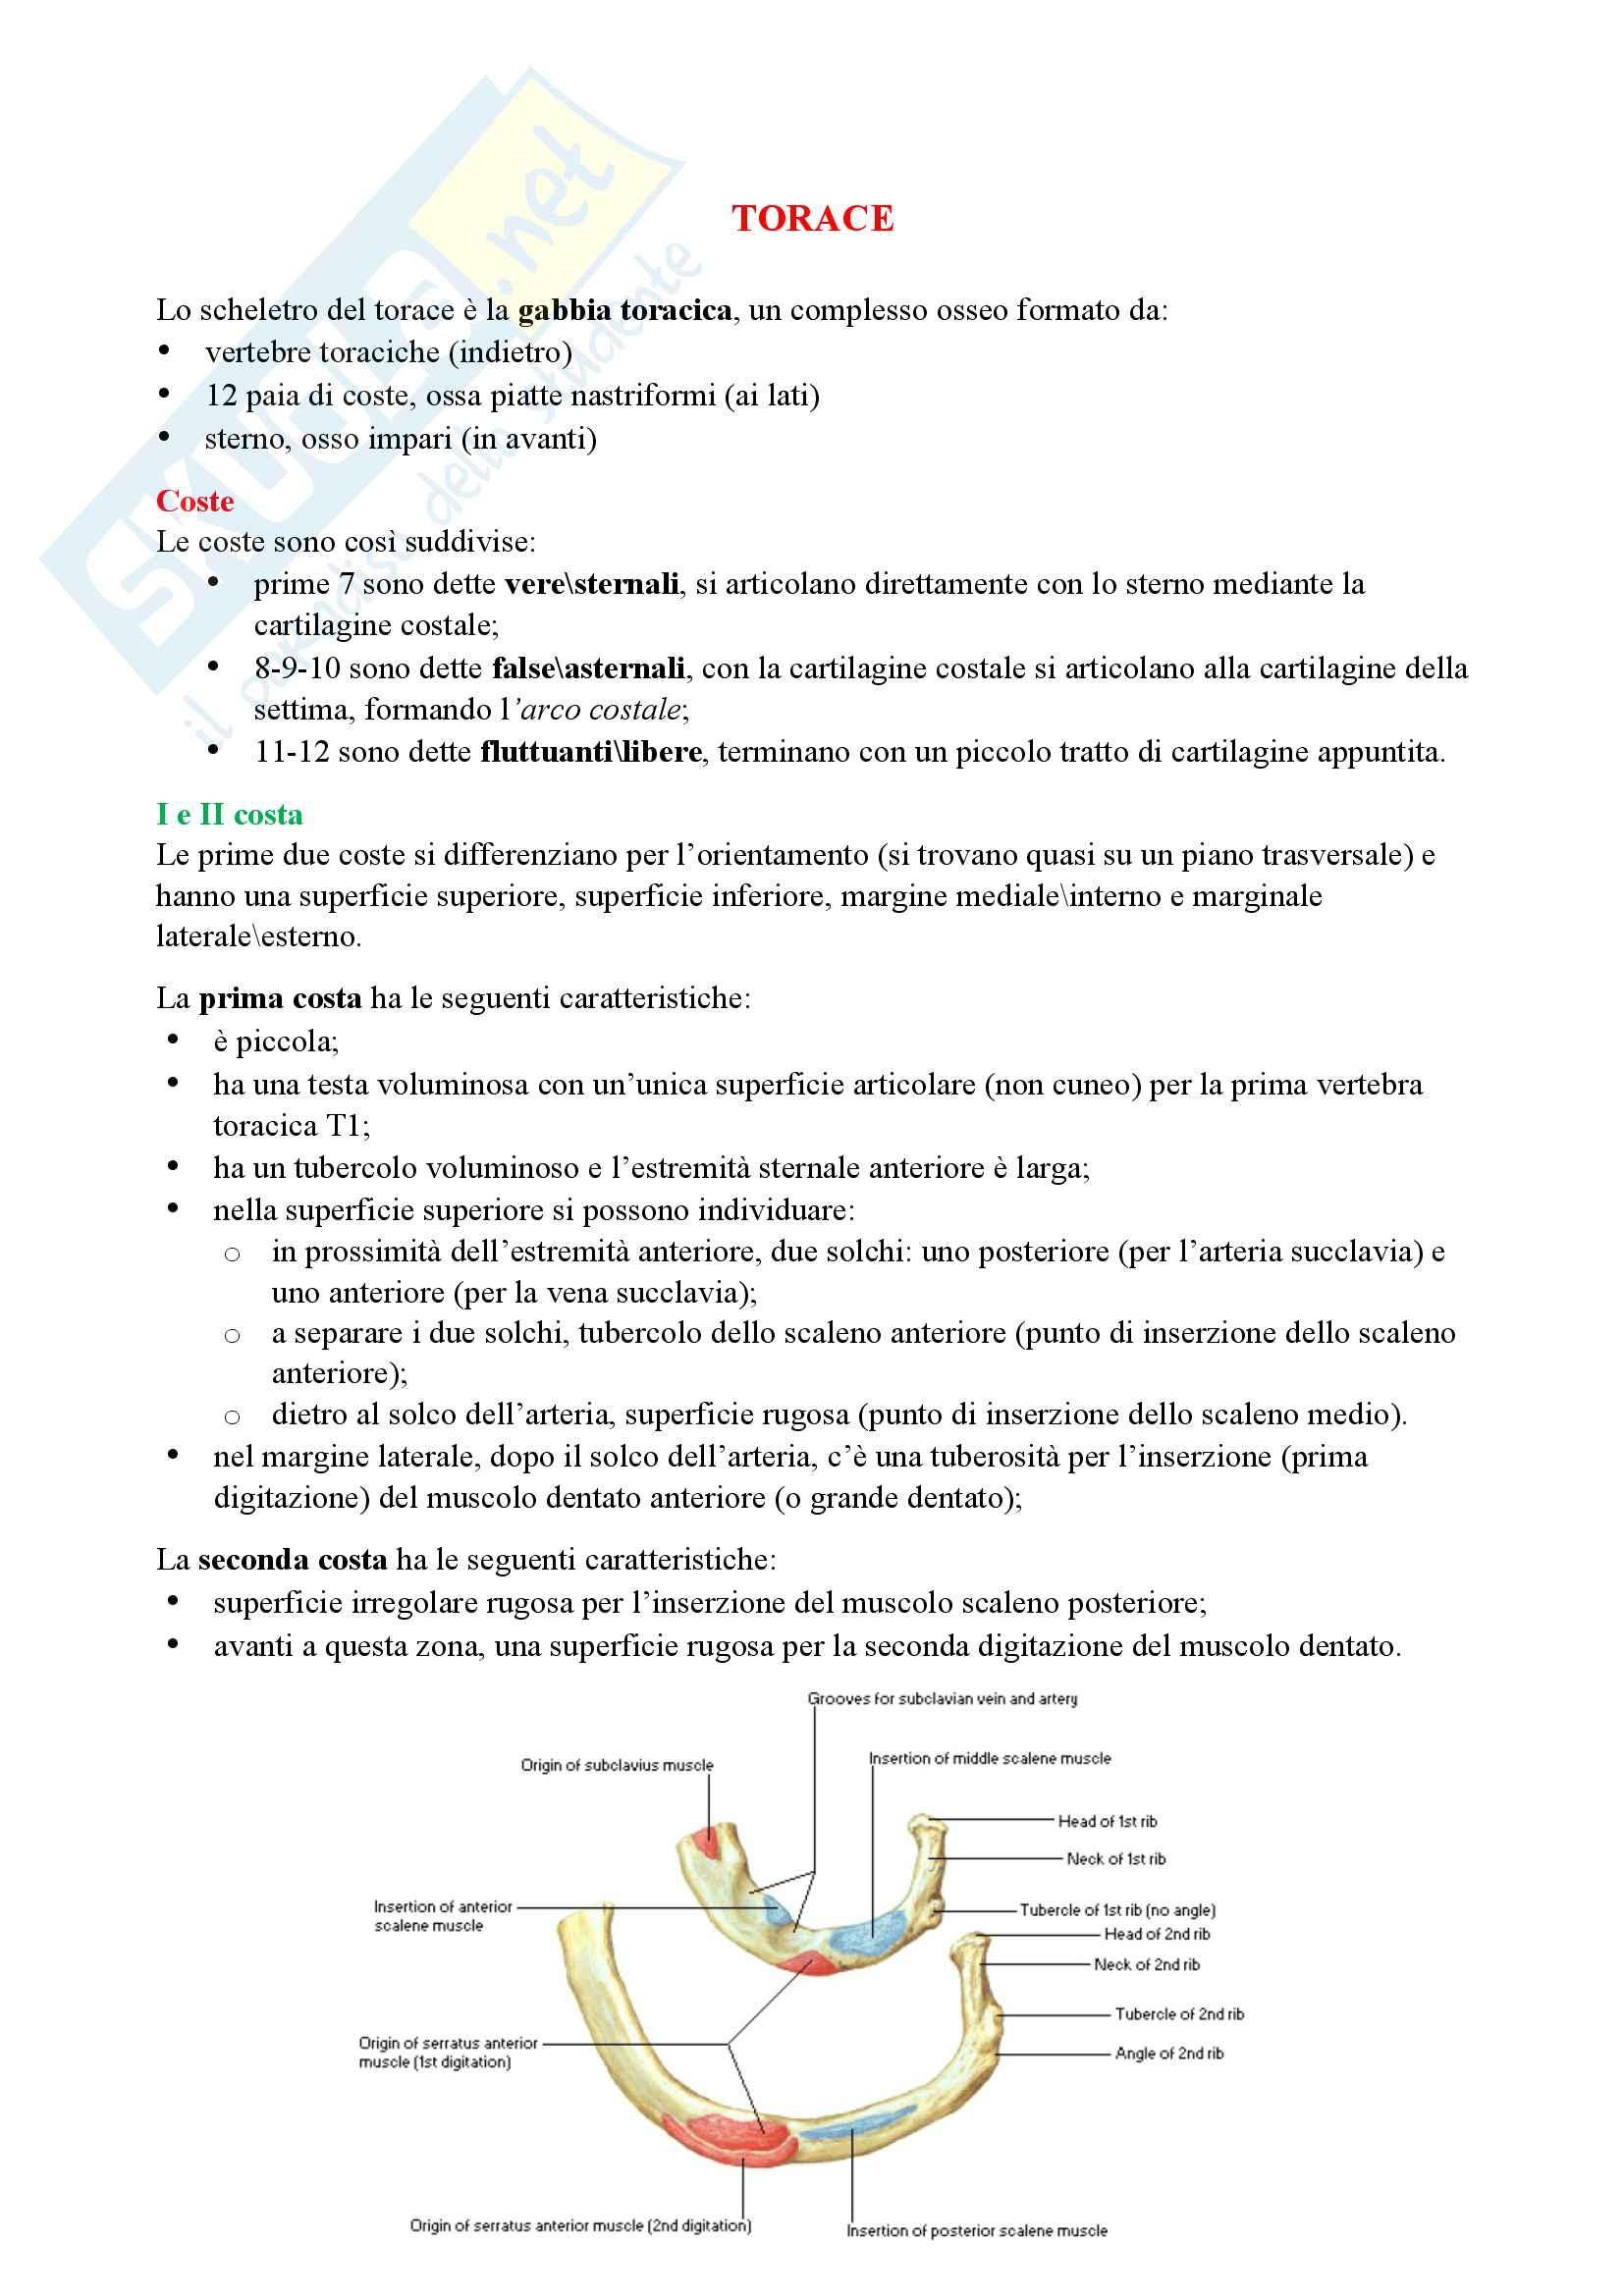 Anatomia - Torace